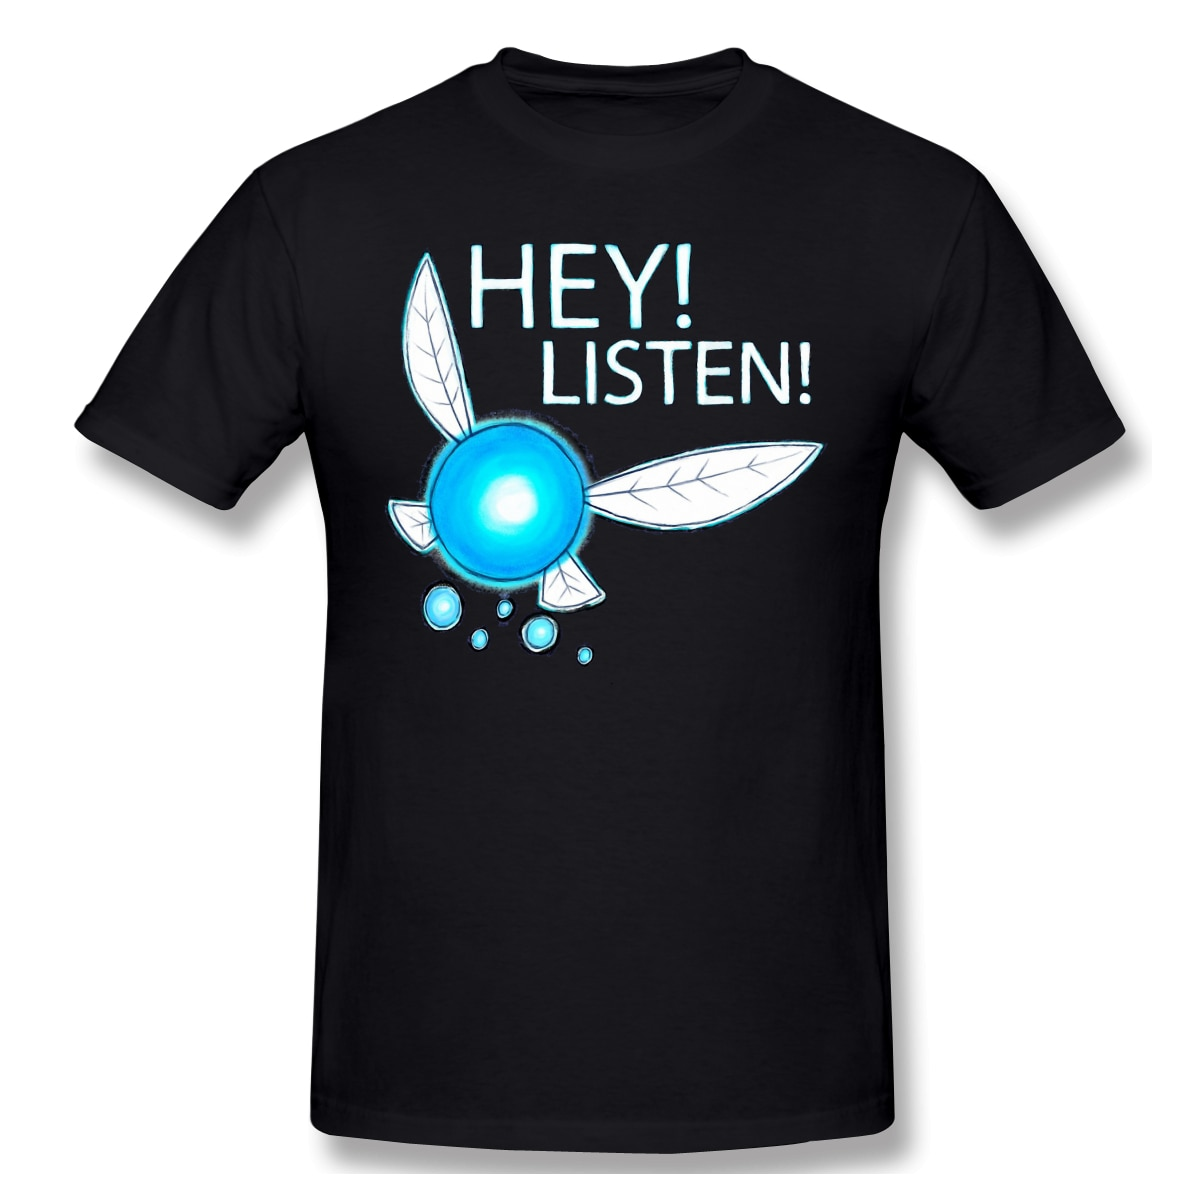 ¡Navi! ¡Oye! Camiseta suelta de manga corta de verano de algodón 100% de alta calidad para hombre de LISTENT